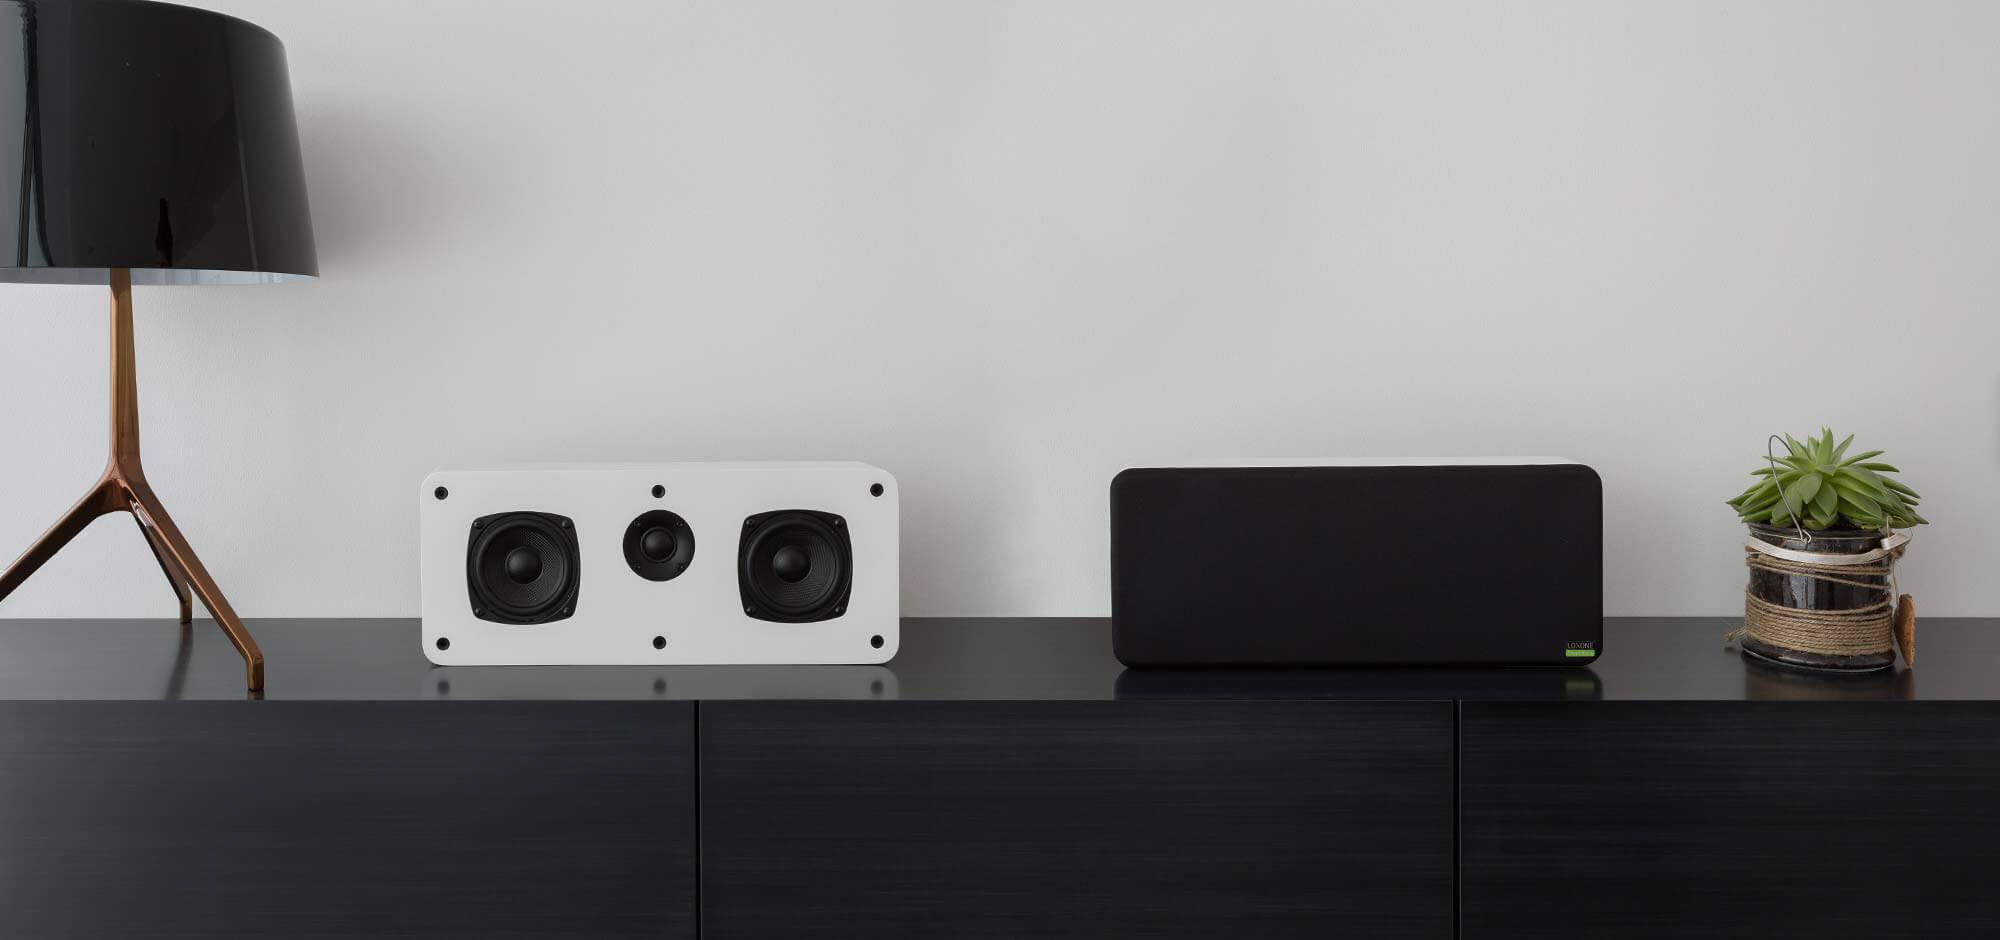 Fullscreen Speakers